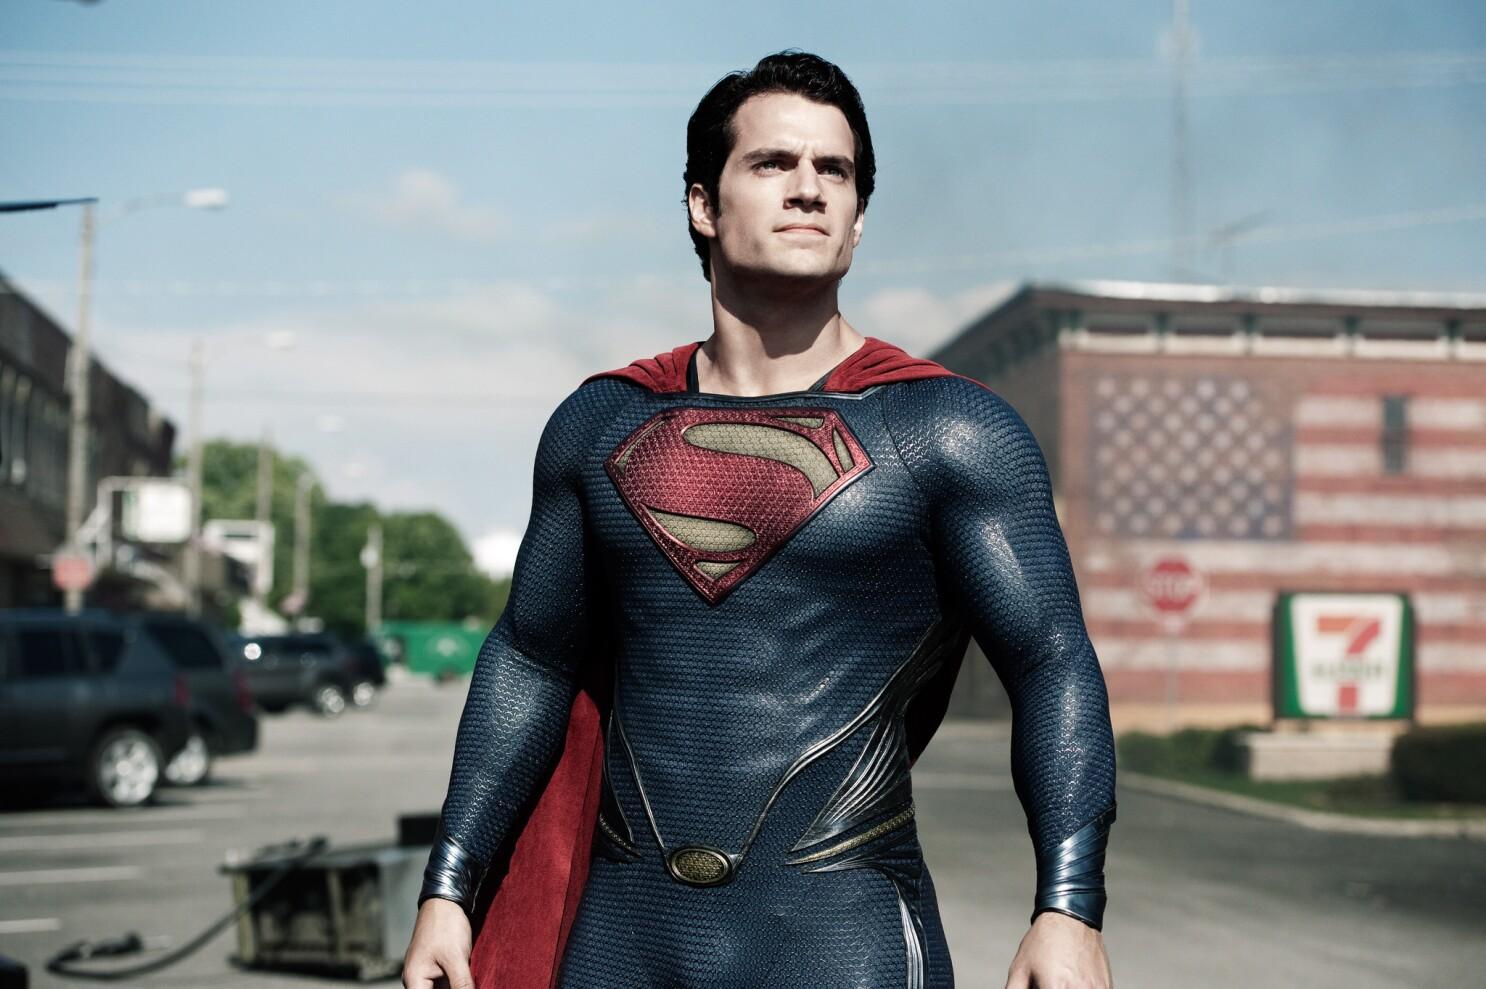 Henry Cavill teases Clark Kent look in 'Batman v Superman' set photo - Los  Angeles Times